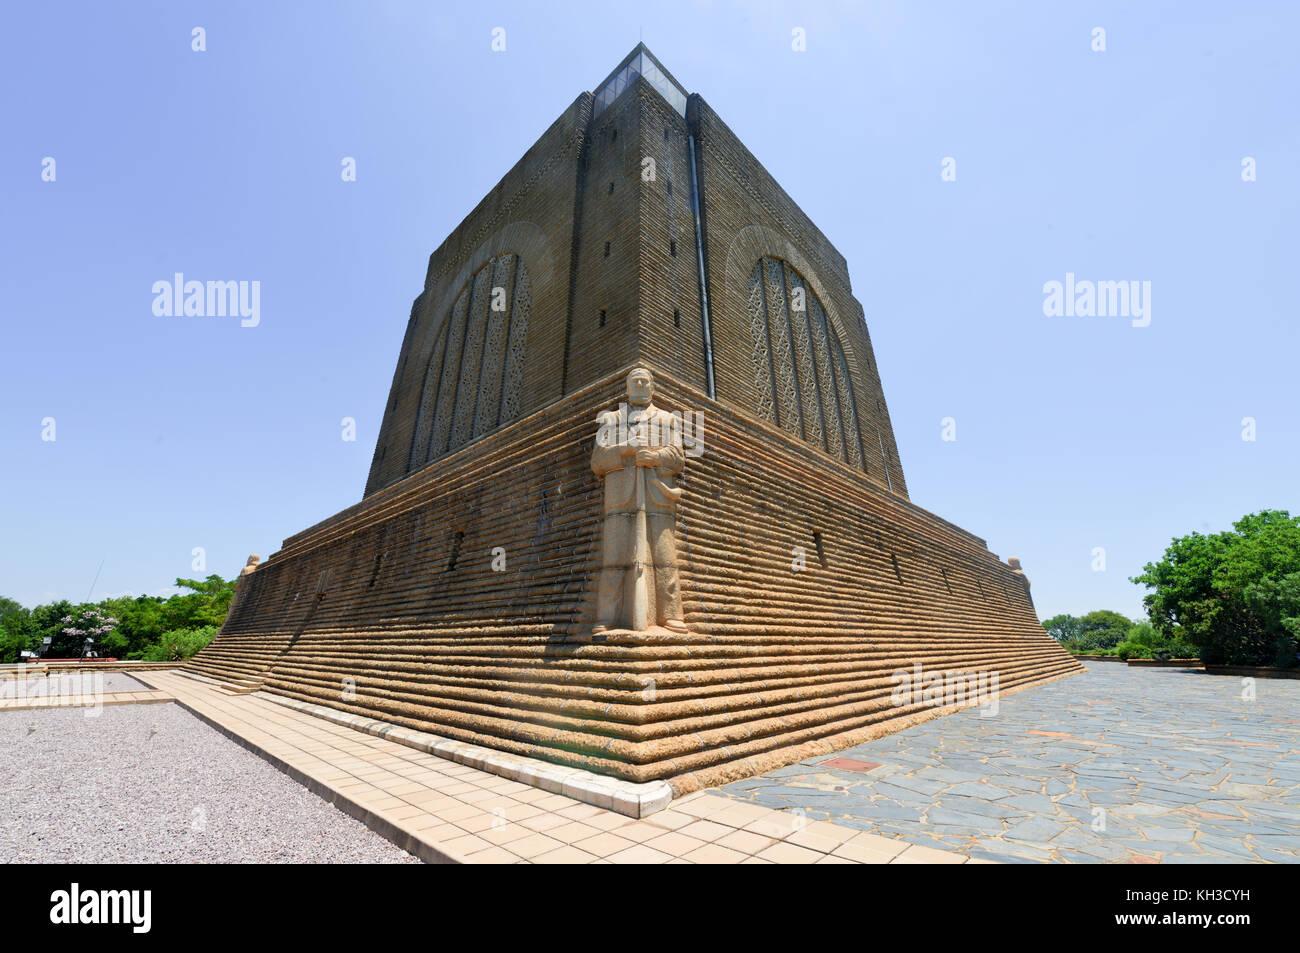 Monument to Afrikaner Leader at Voortrekker Monument. The Voortrekker Monument is located just south of Pretoria - Stock Image